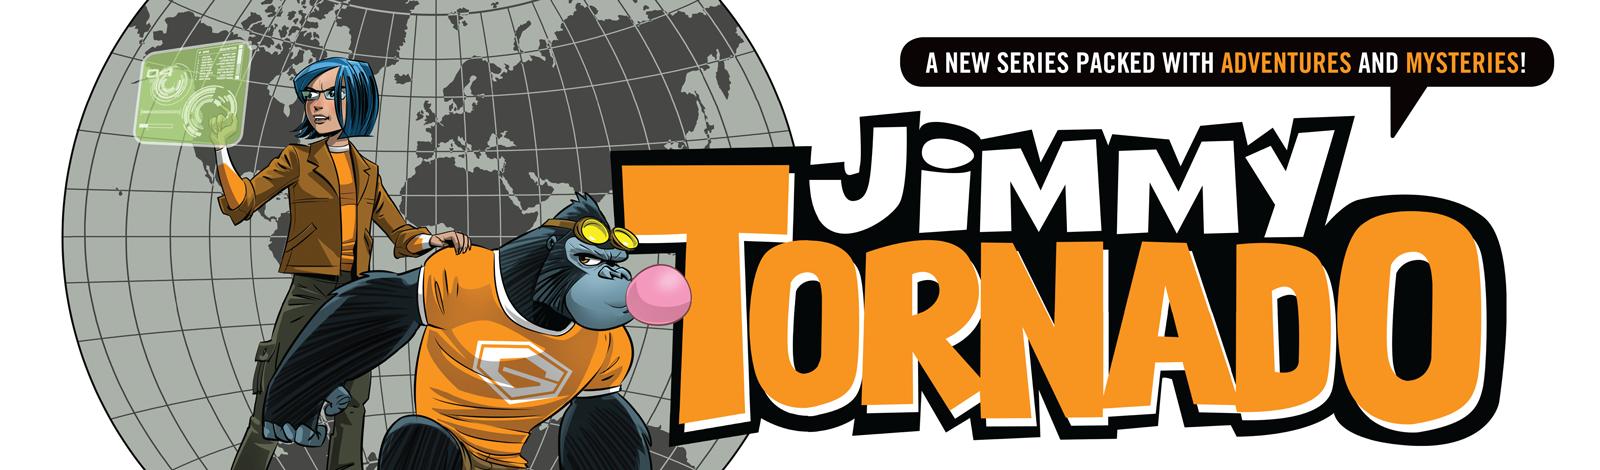 Jimmy Tornado T1